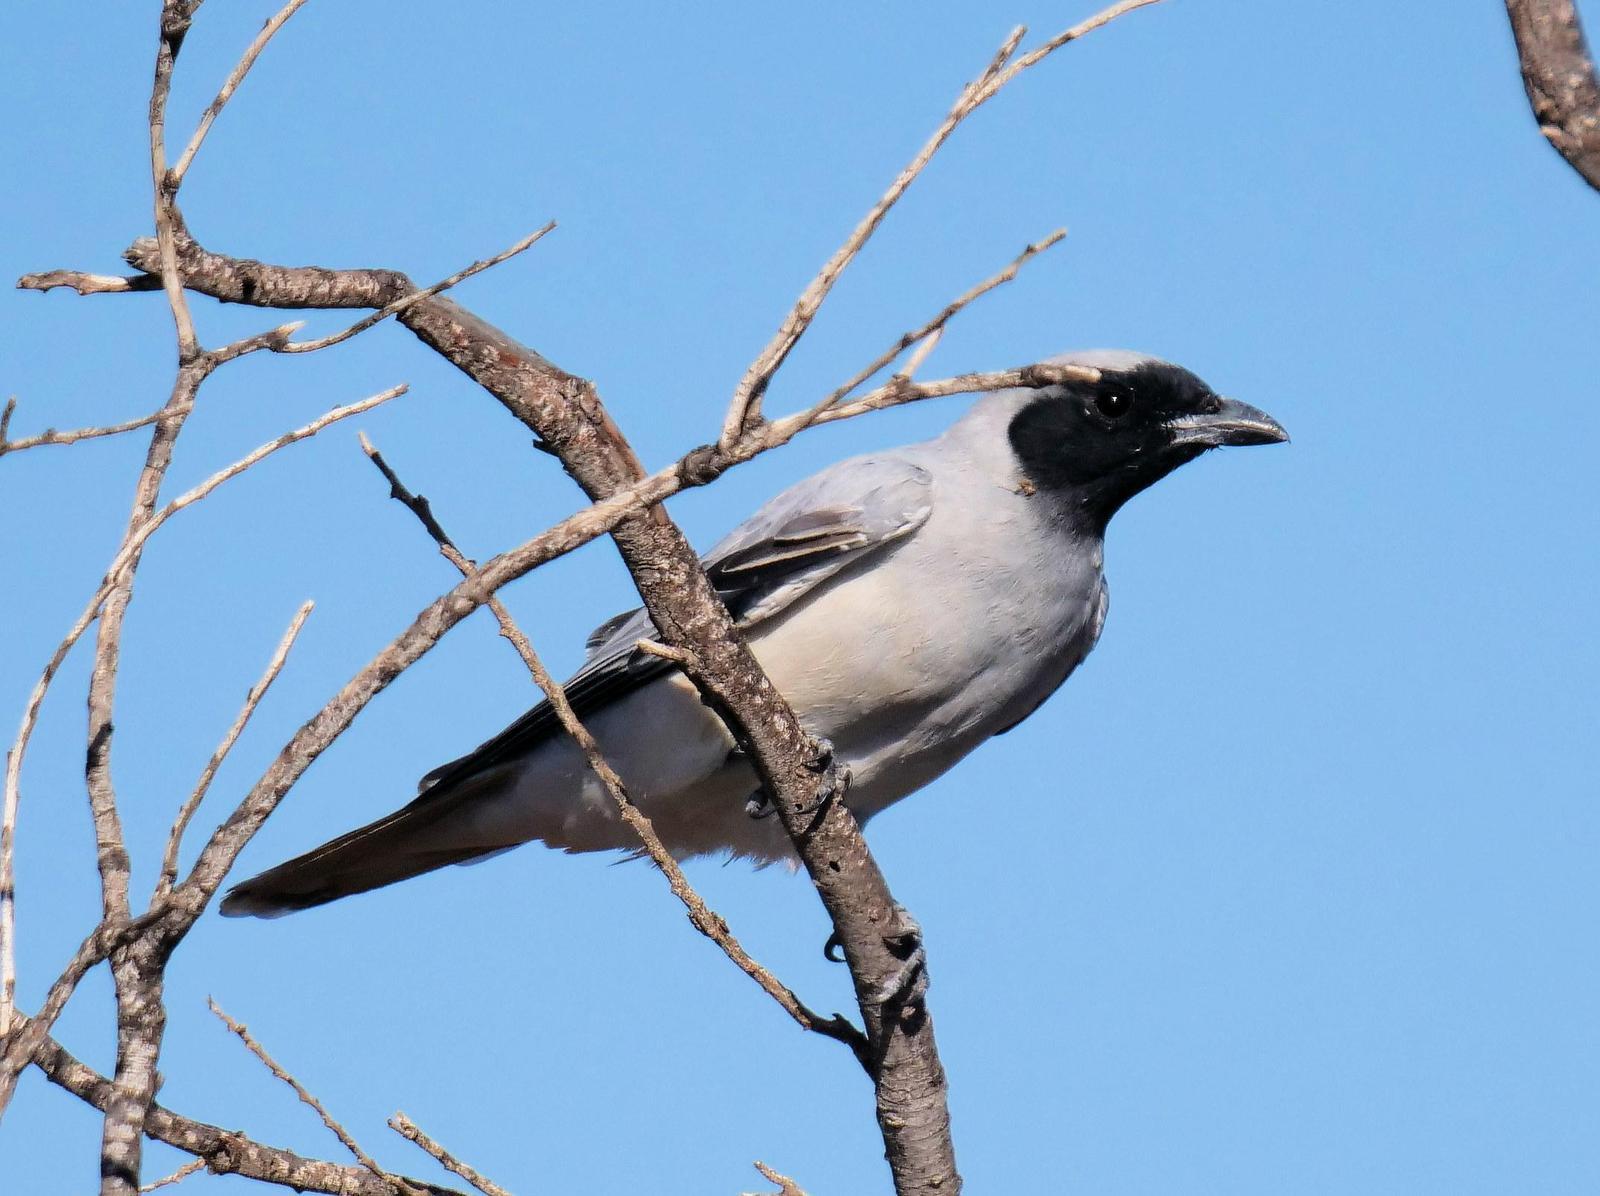 Black-faced Cuckooshrike Photo by Peter Lowe